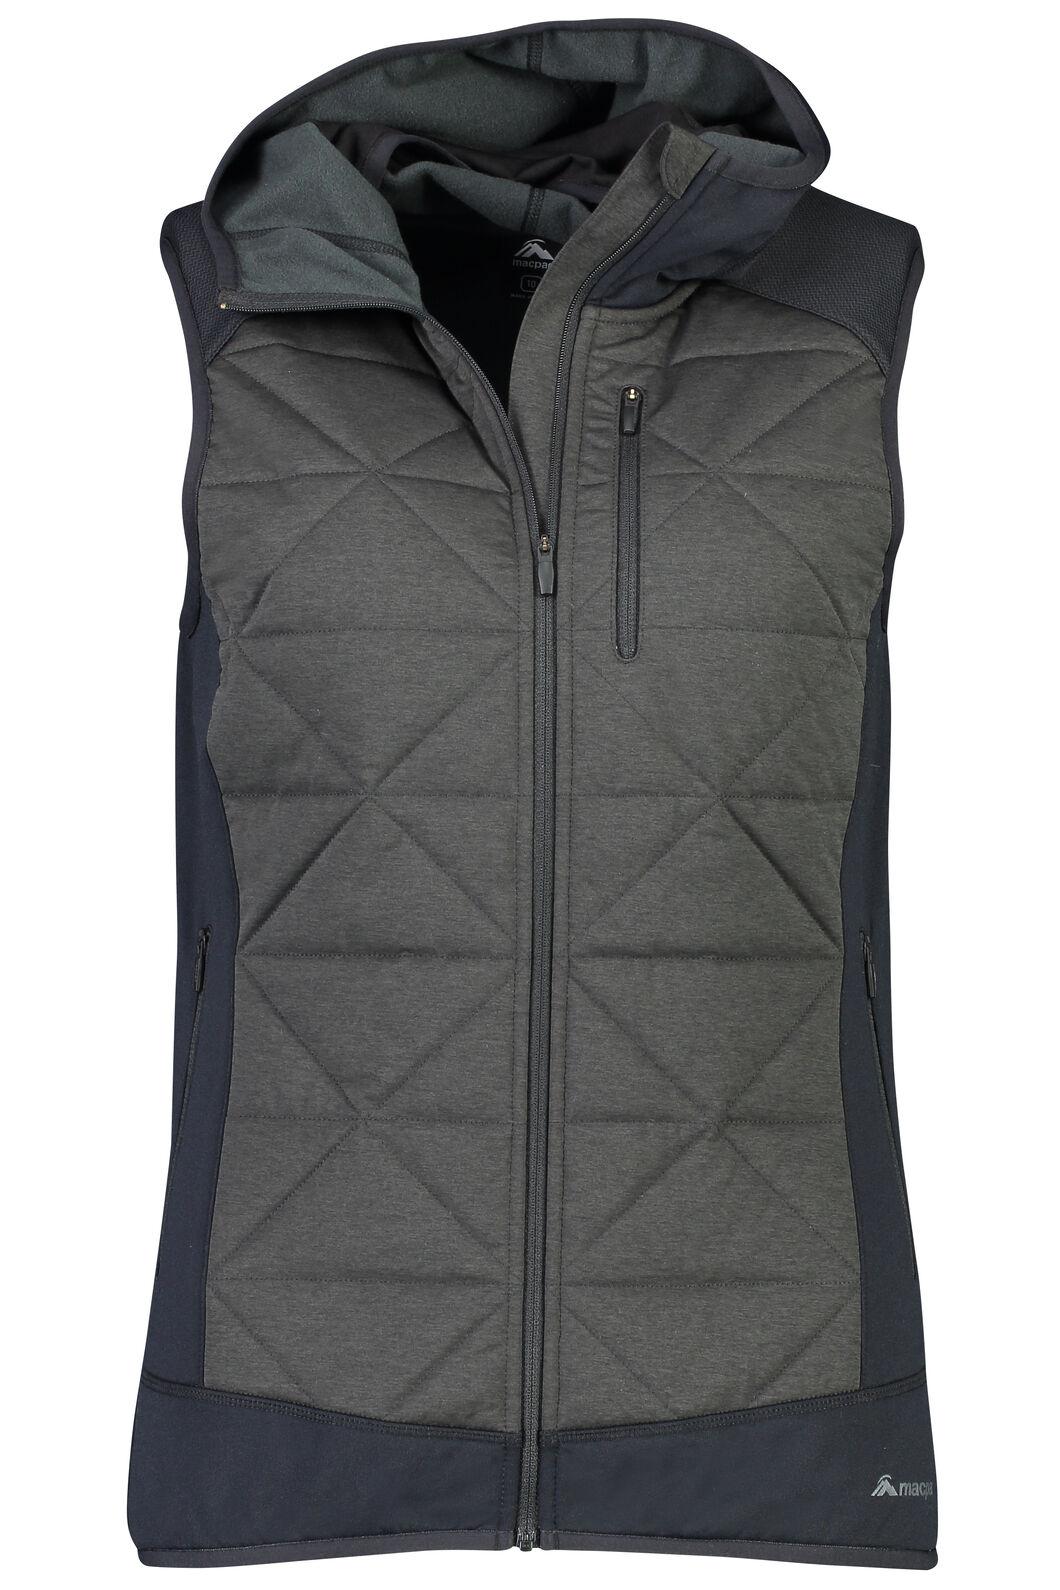 Accelerate PrimaLoft® Vest - Women's, Black, hi-res